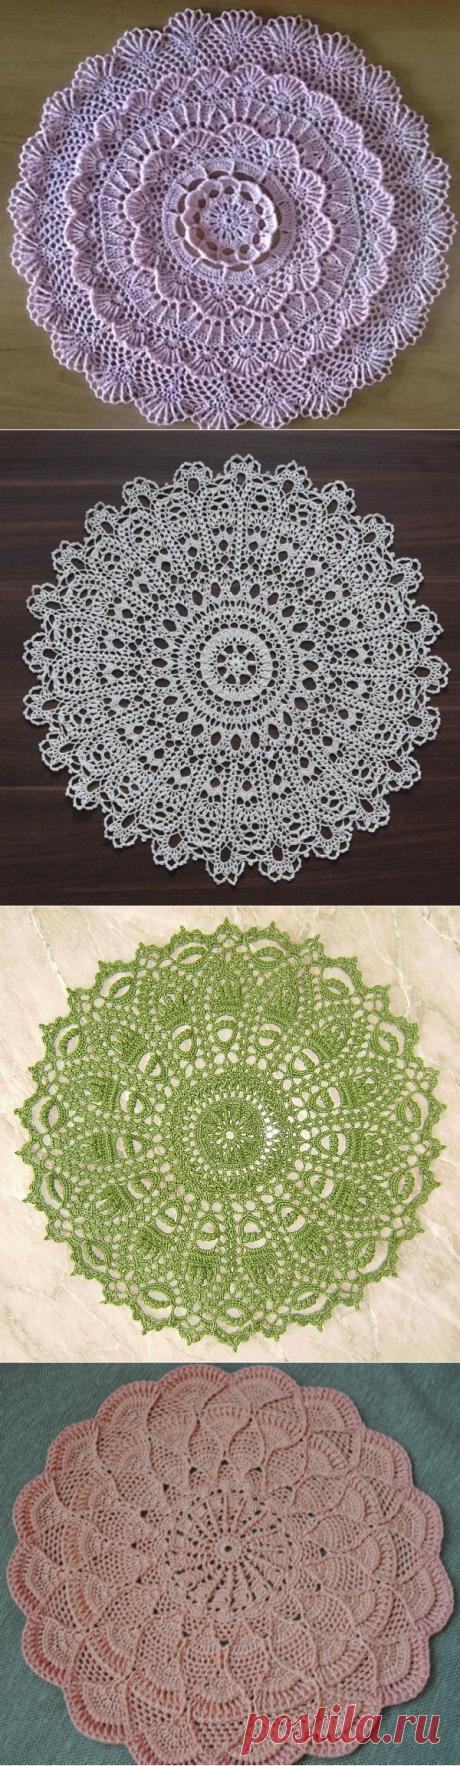 Описание вязания и схемы салфеток крючком - Crochet.Modnoe Vyazanie ru.rom